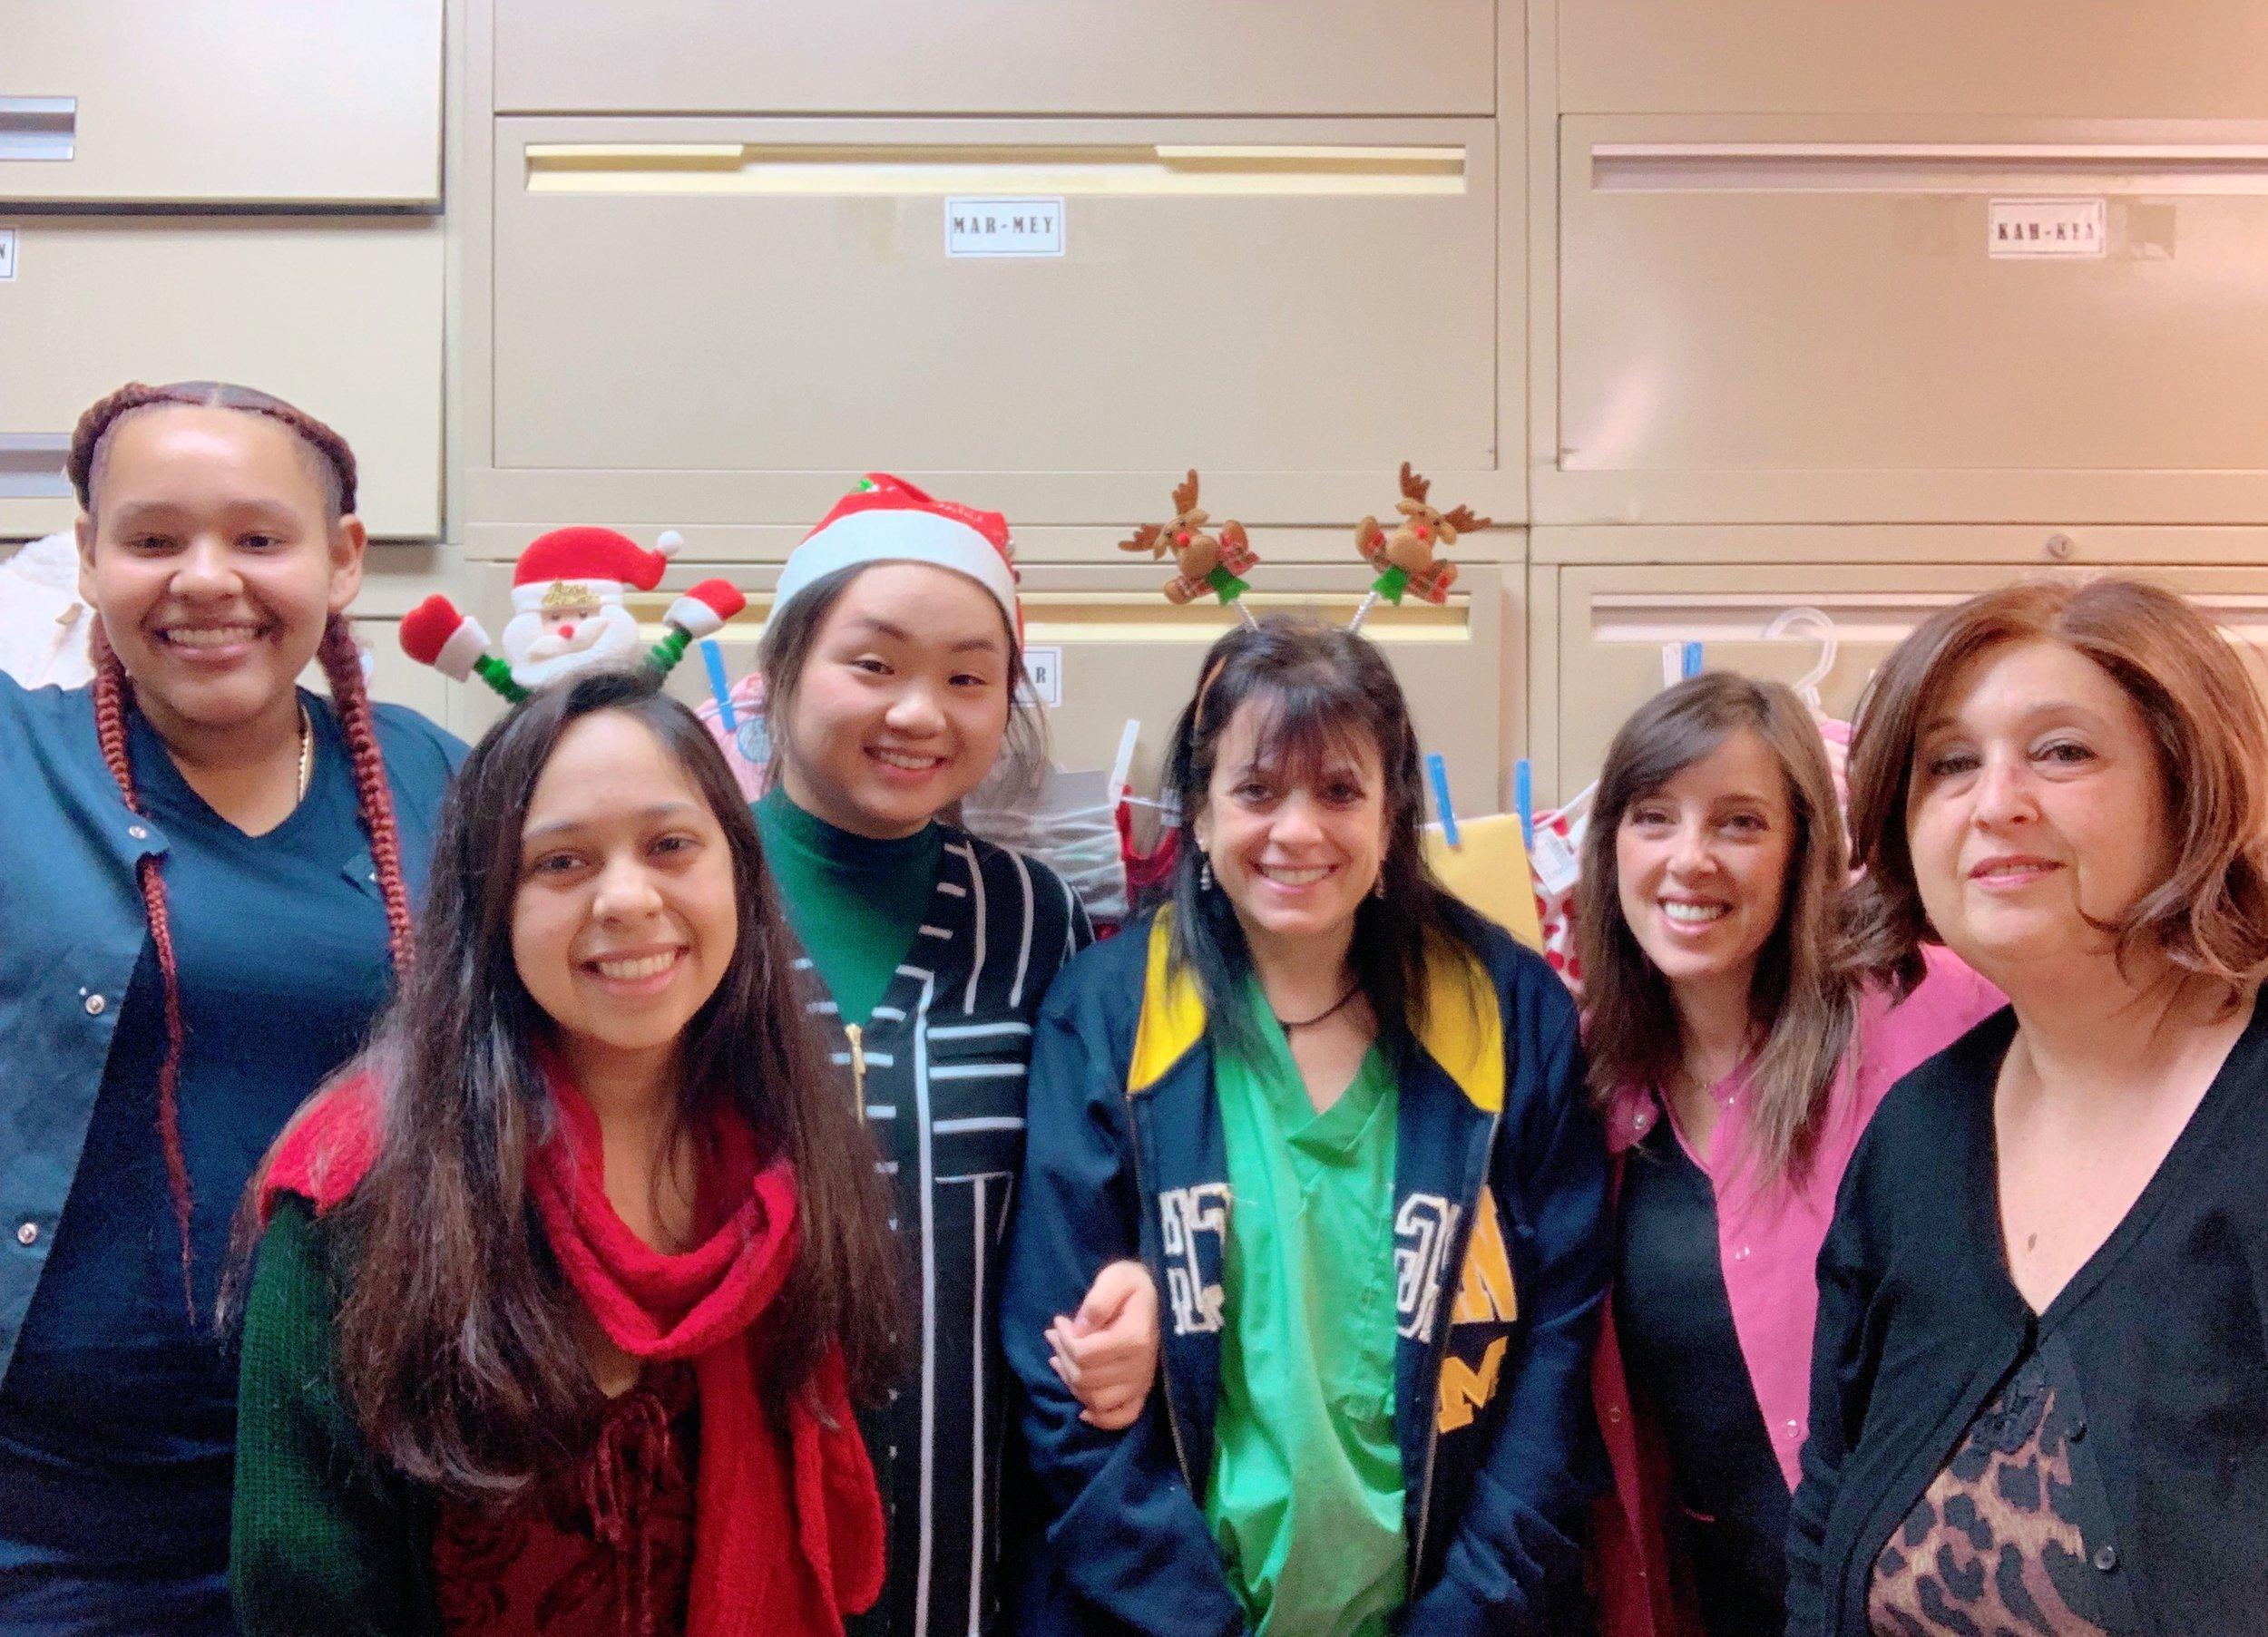 From left to right: Sabrina Cadena, Kristel Velez, Min Lu, Jodi Hollander, Michele Ruocco and Hope Cohen.